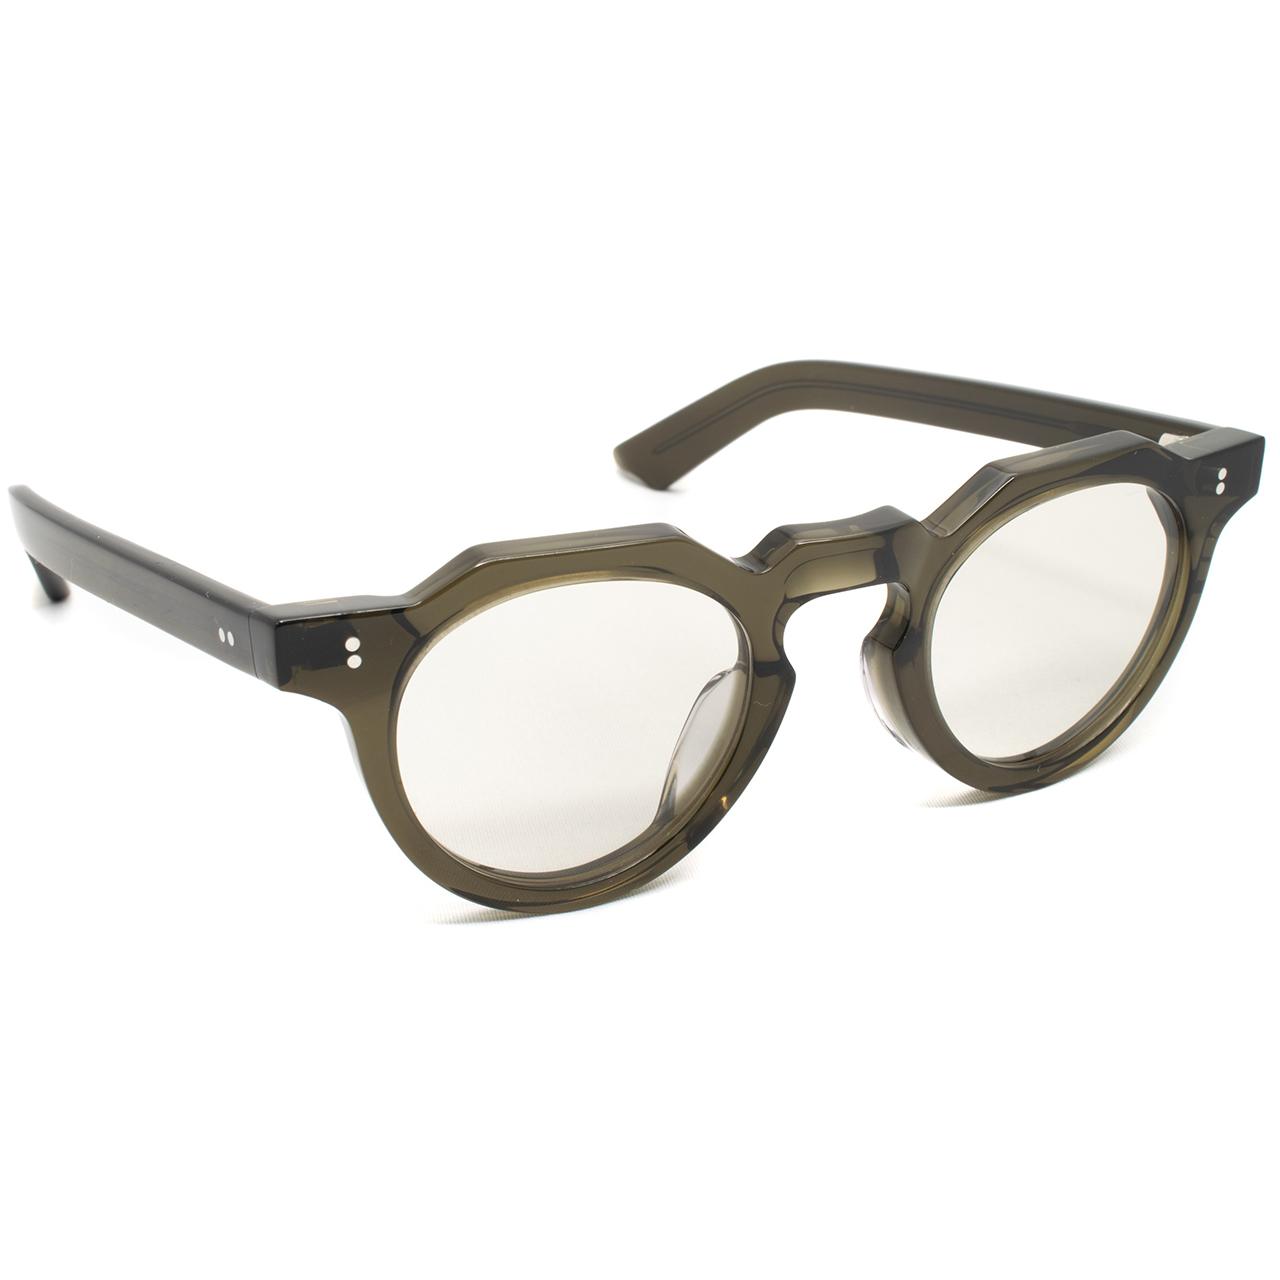 Few (フュー) 眼鏡 (サングラス) 【F5】【KHAKI (C2)】